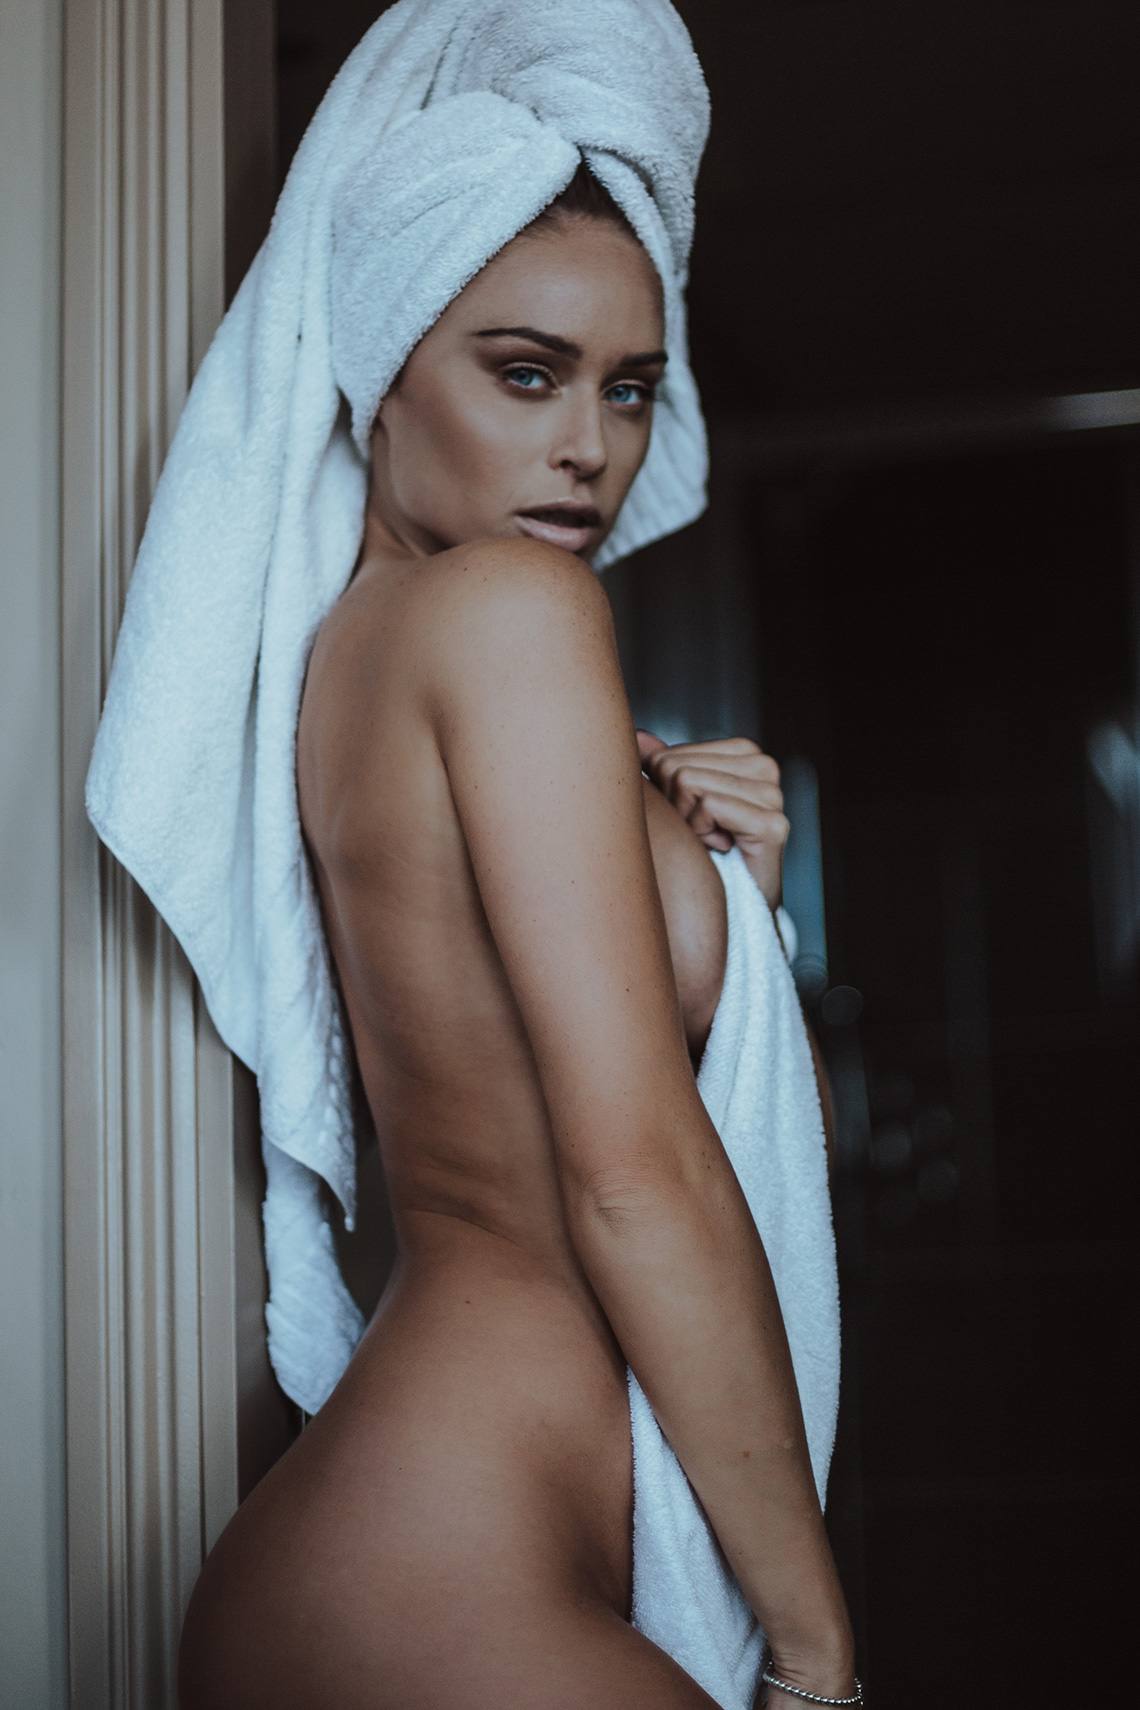 Aylar dianati lie naked